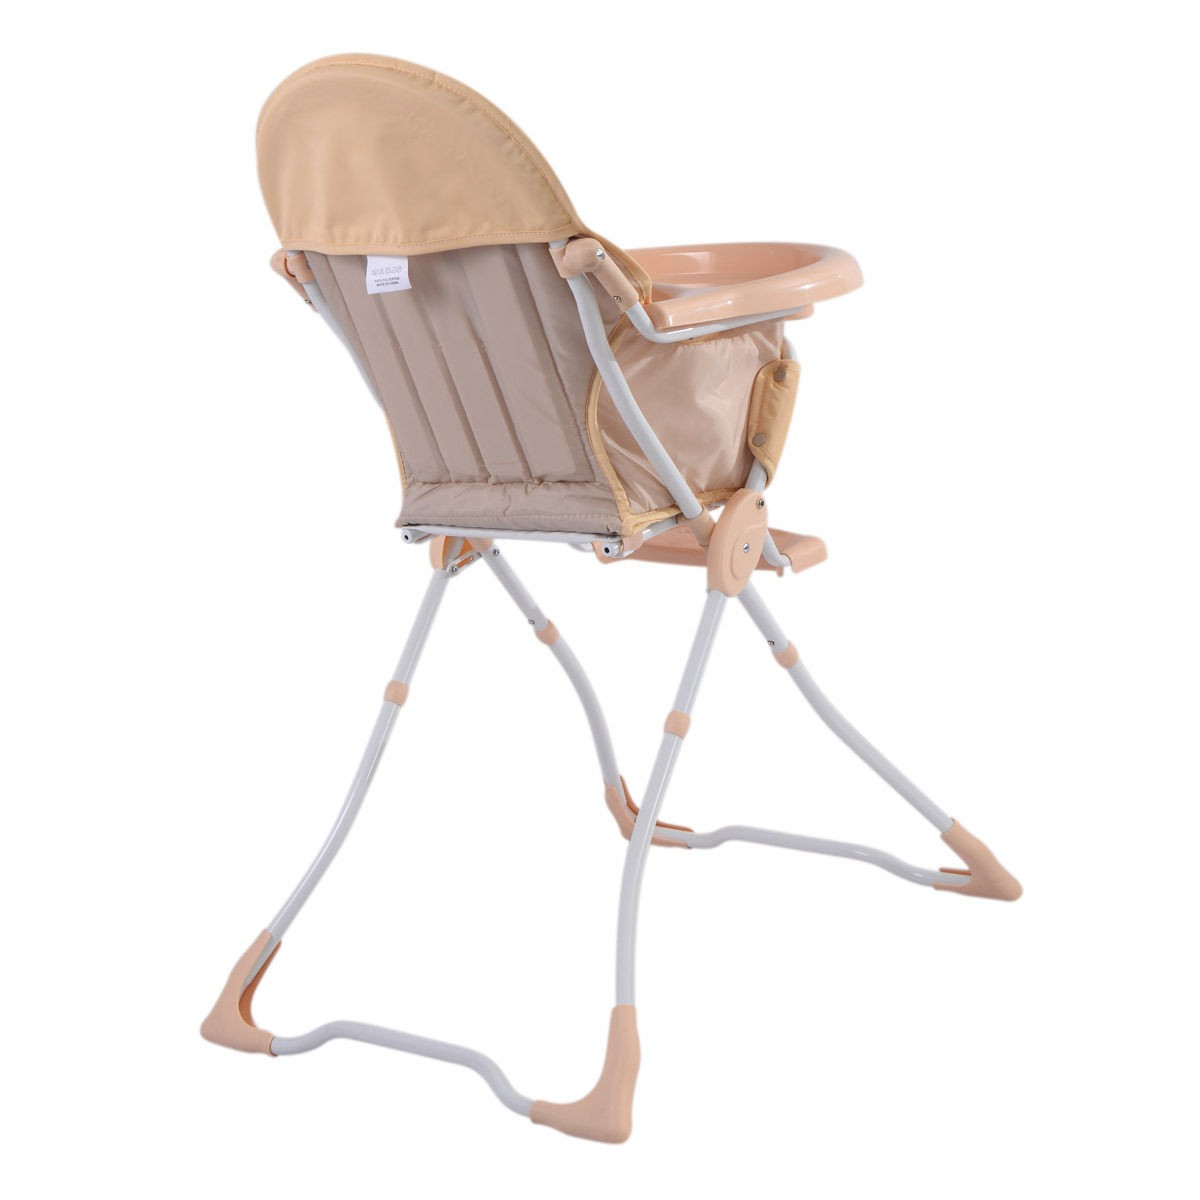 portable safe baby high chair infant toddler feeding booster seat folding us ebay. Black Bedroom Furniture Sets. Home Design Ideas